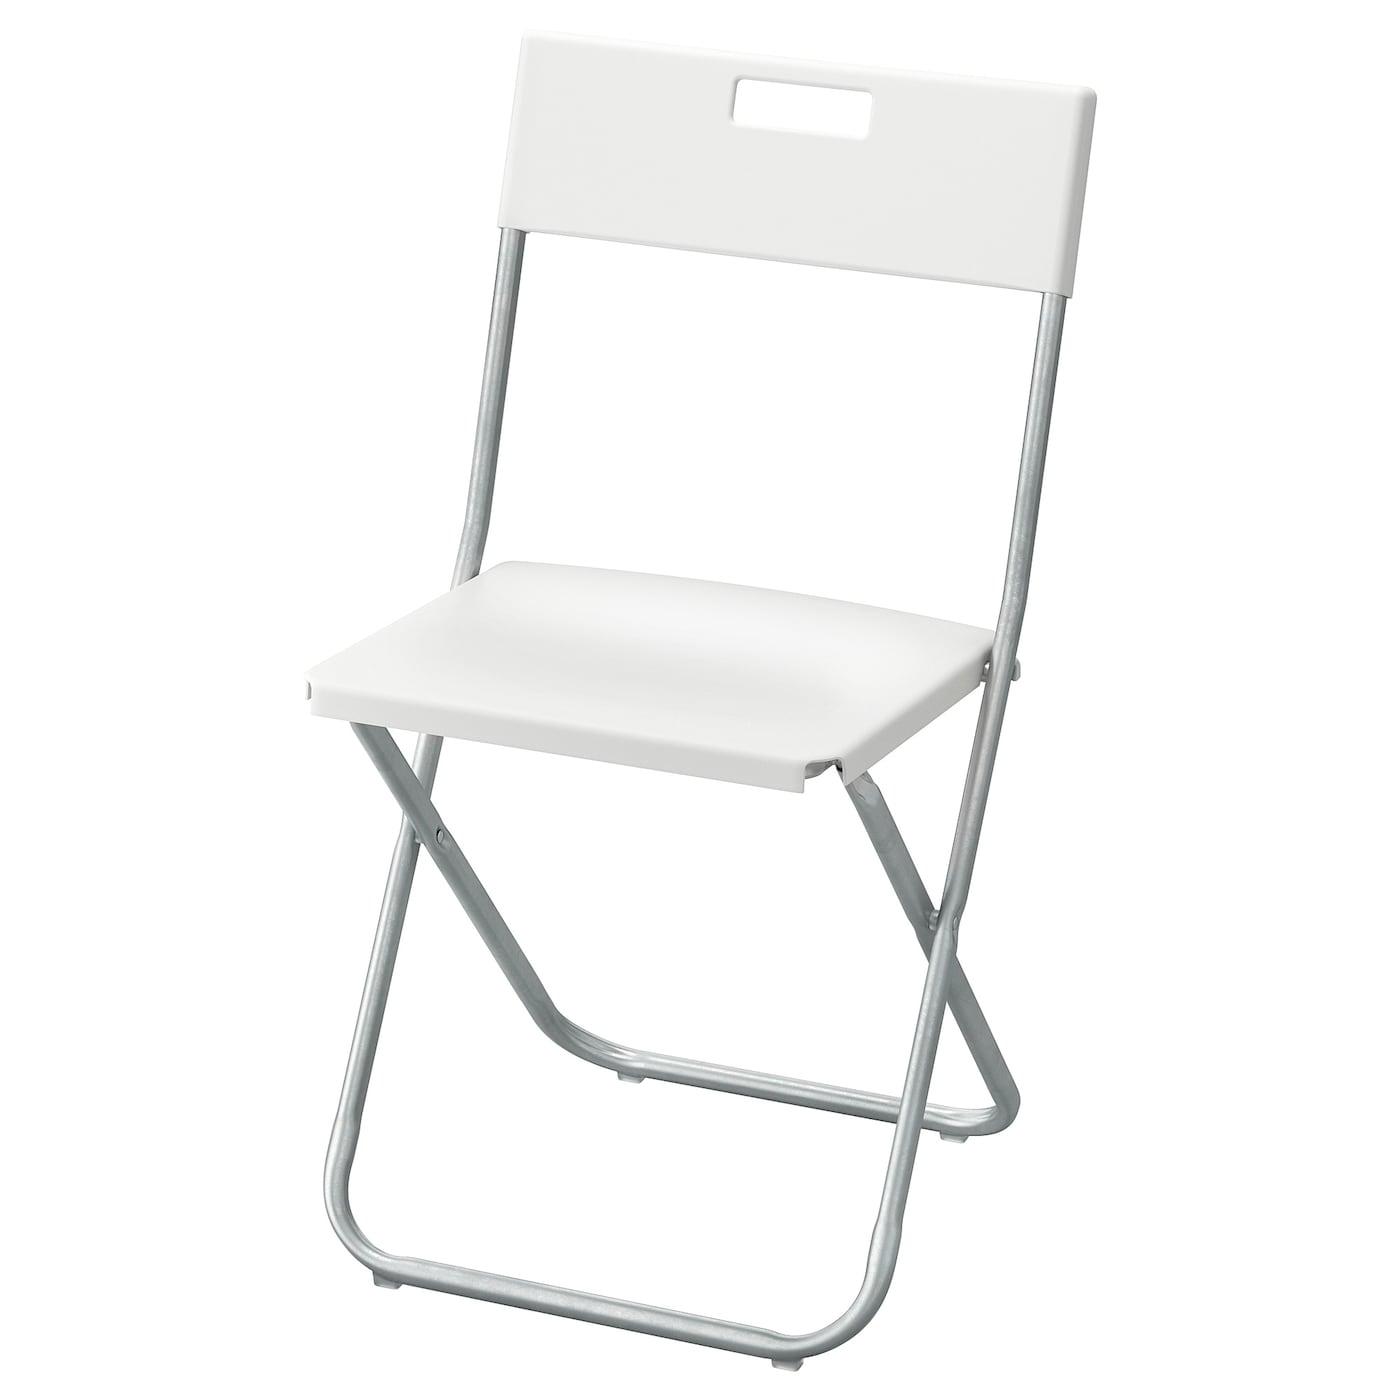 Gunde Folding Chair White Ikea